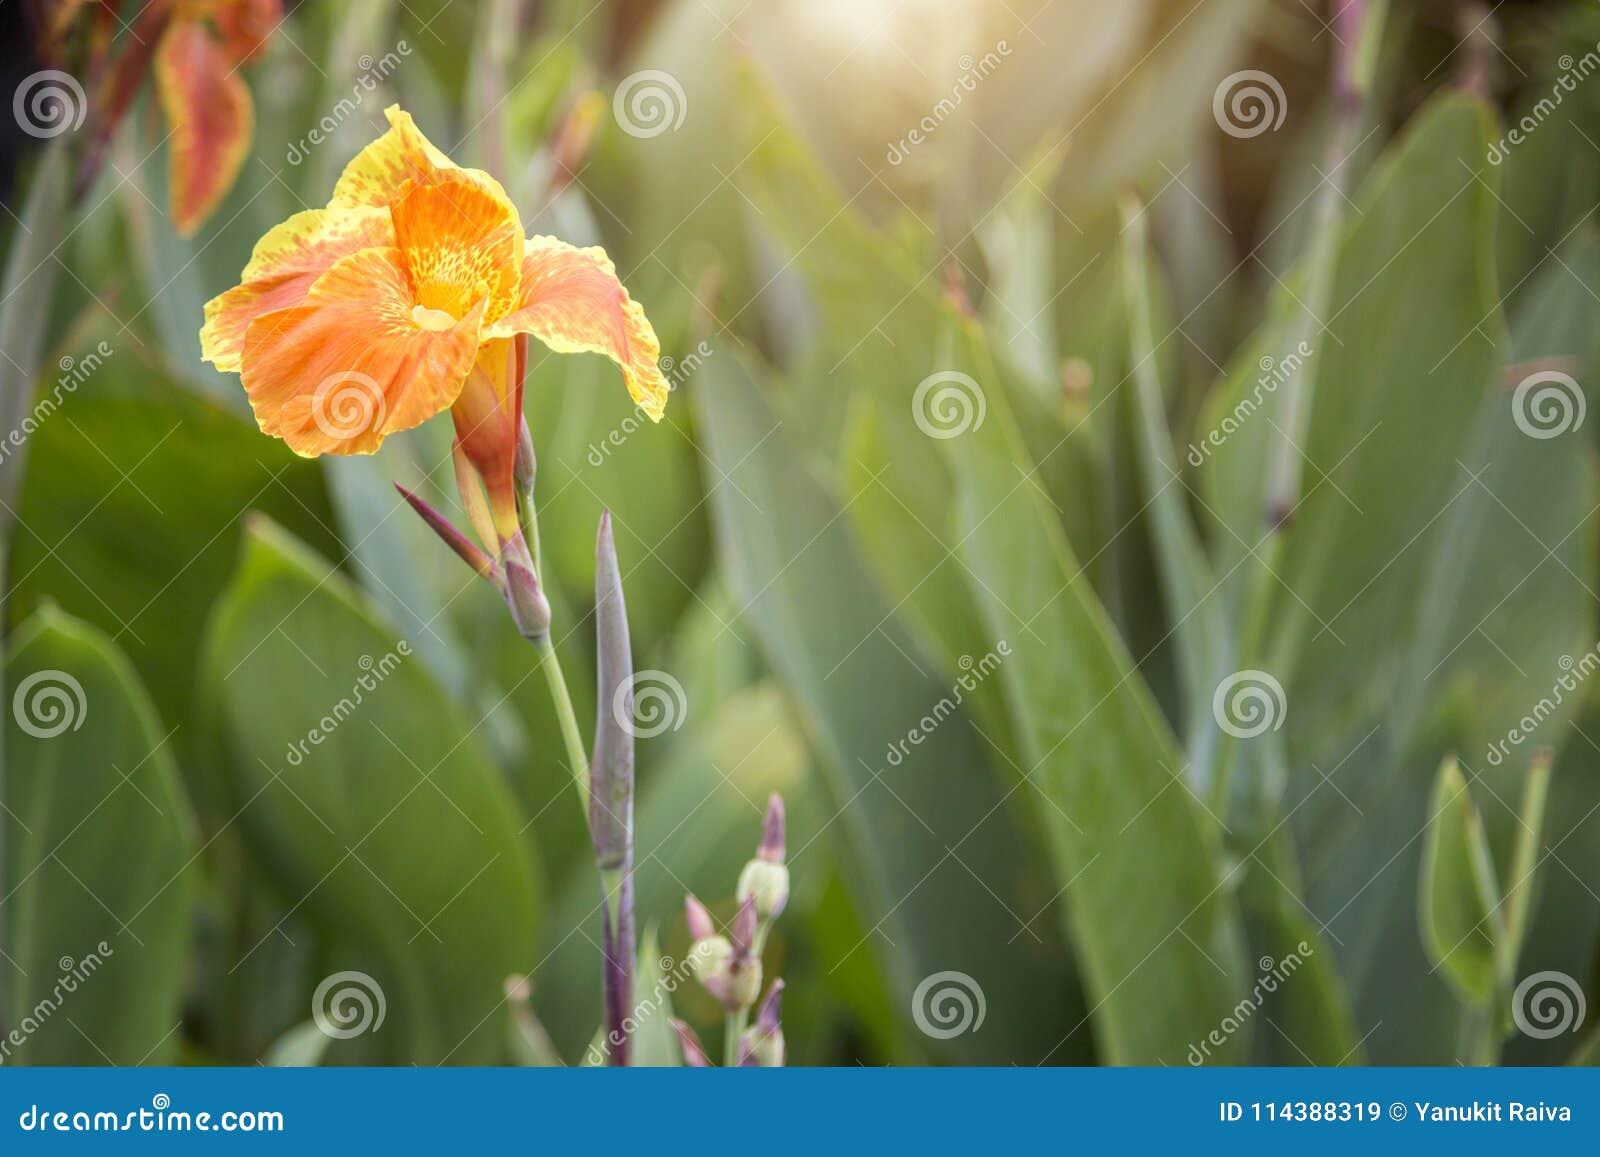 Focus Yellow Canna Flower On Garden In Morning Light Stock Image